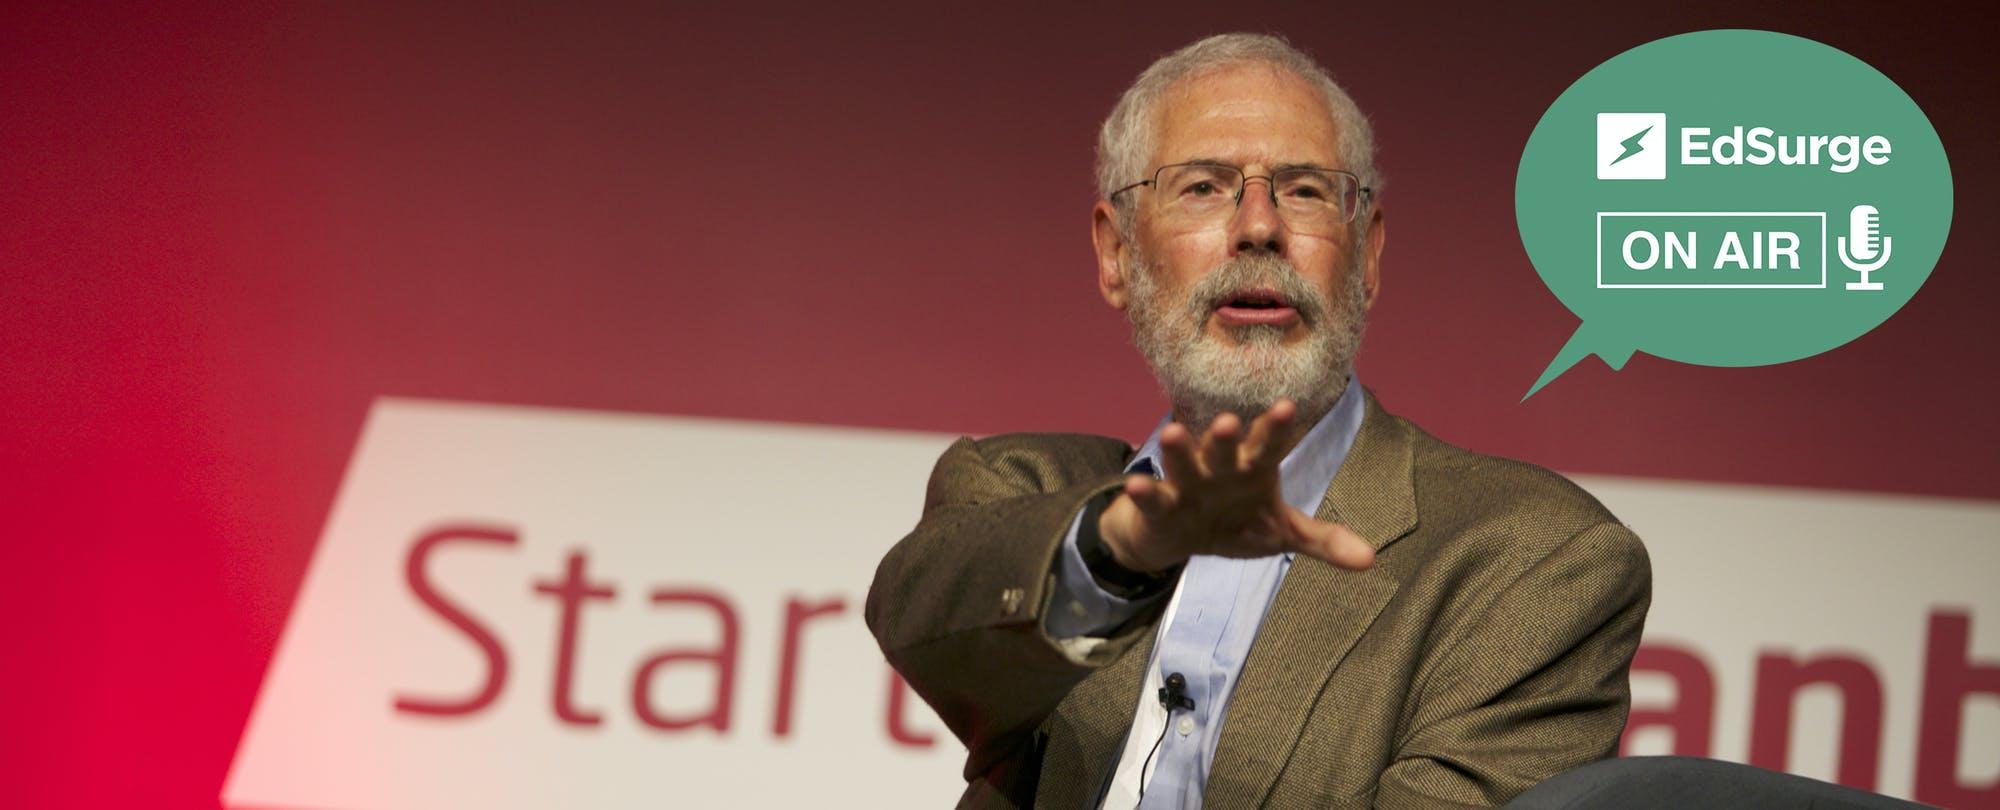 Is Running a Company Like Leading a Classroom? Steve Blank on Entrepreneurship and Education